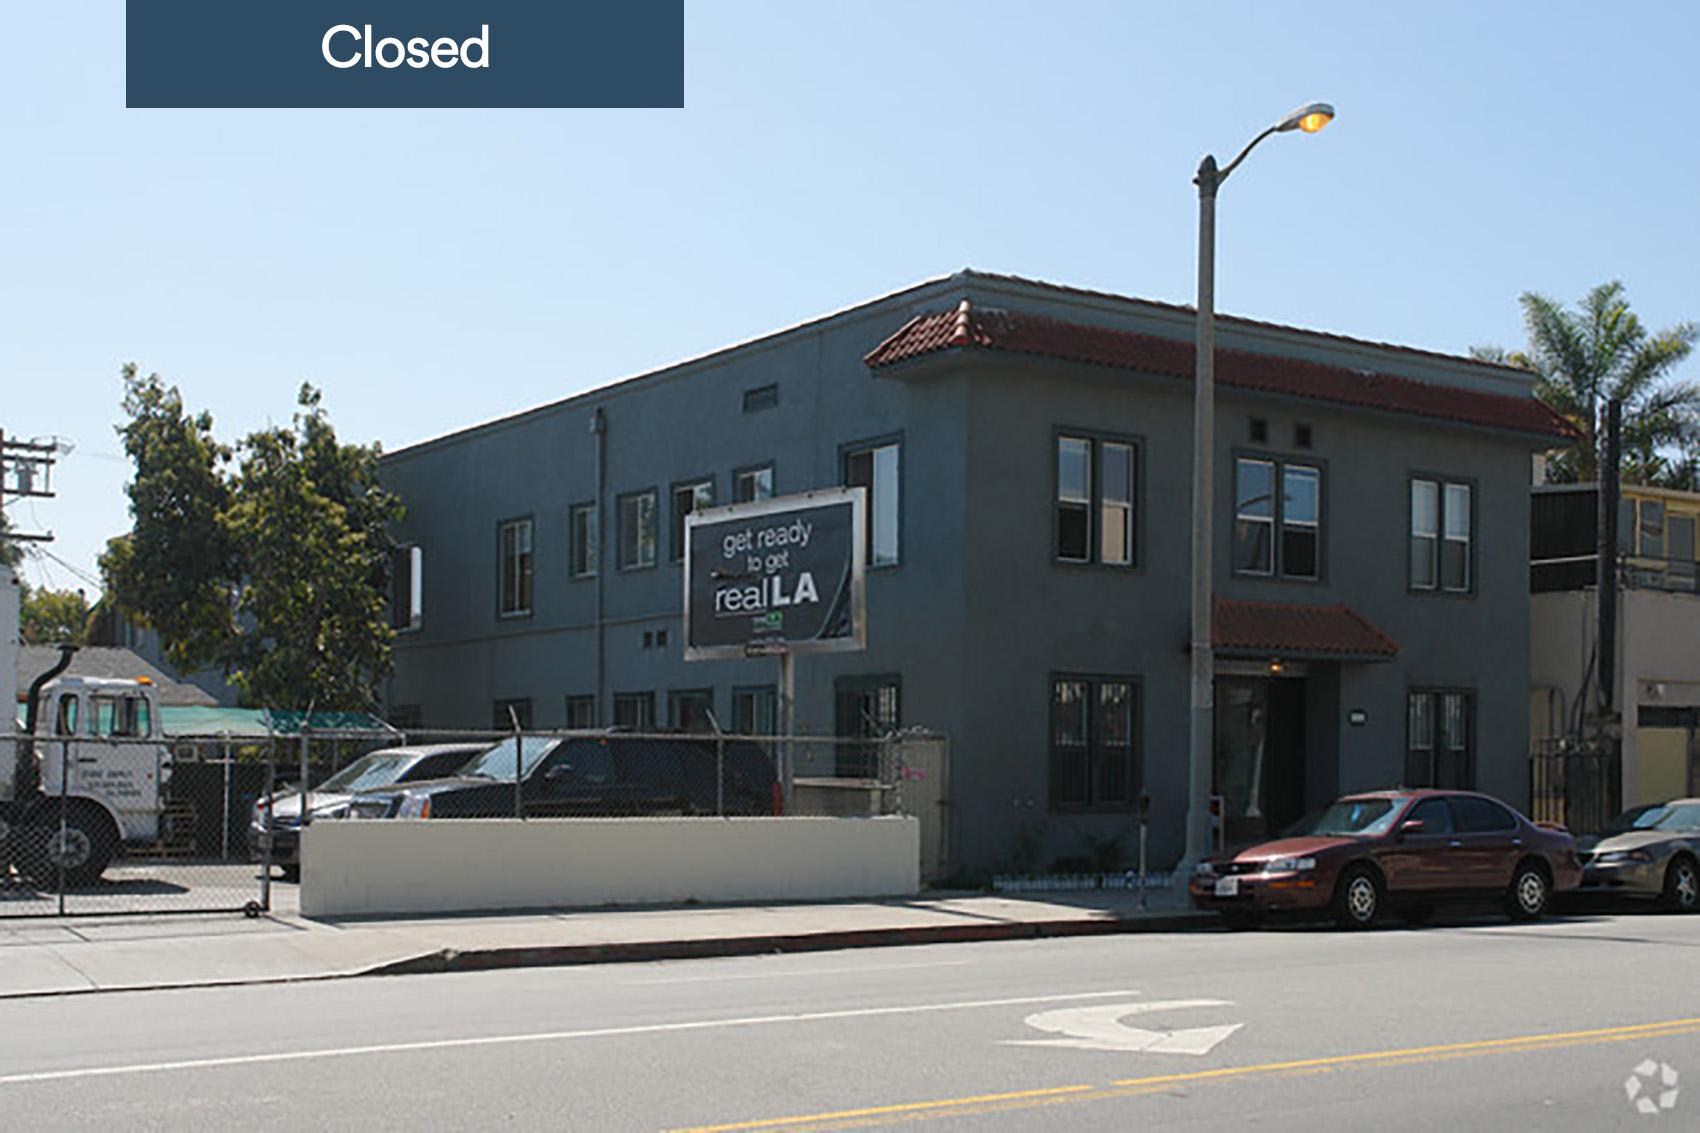 4266-melrose-avenue-los-angeles-ca-primary-photo copy.jpg